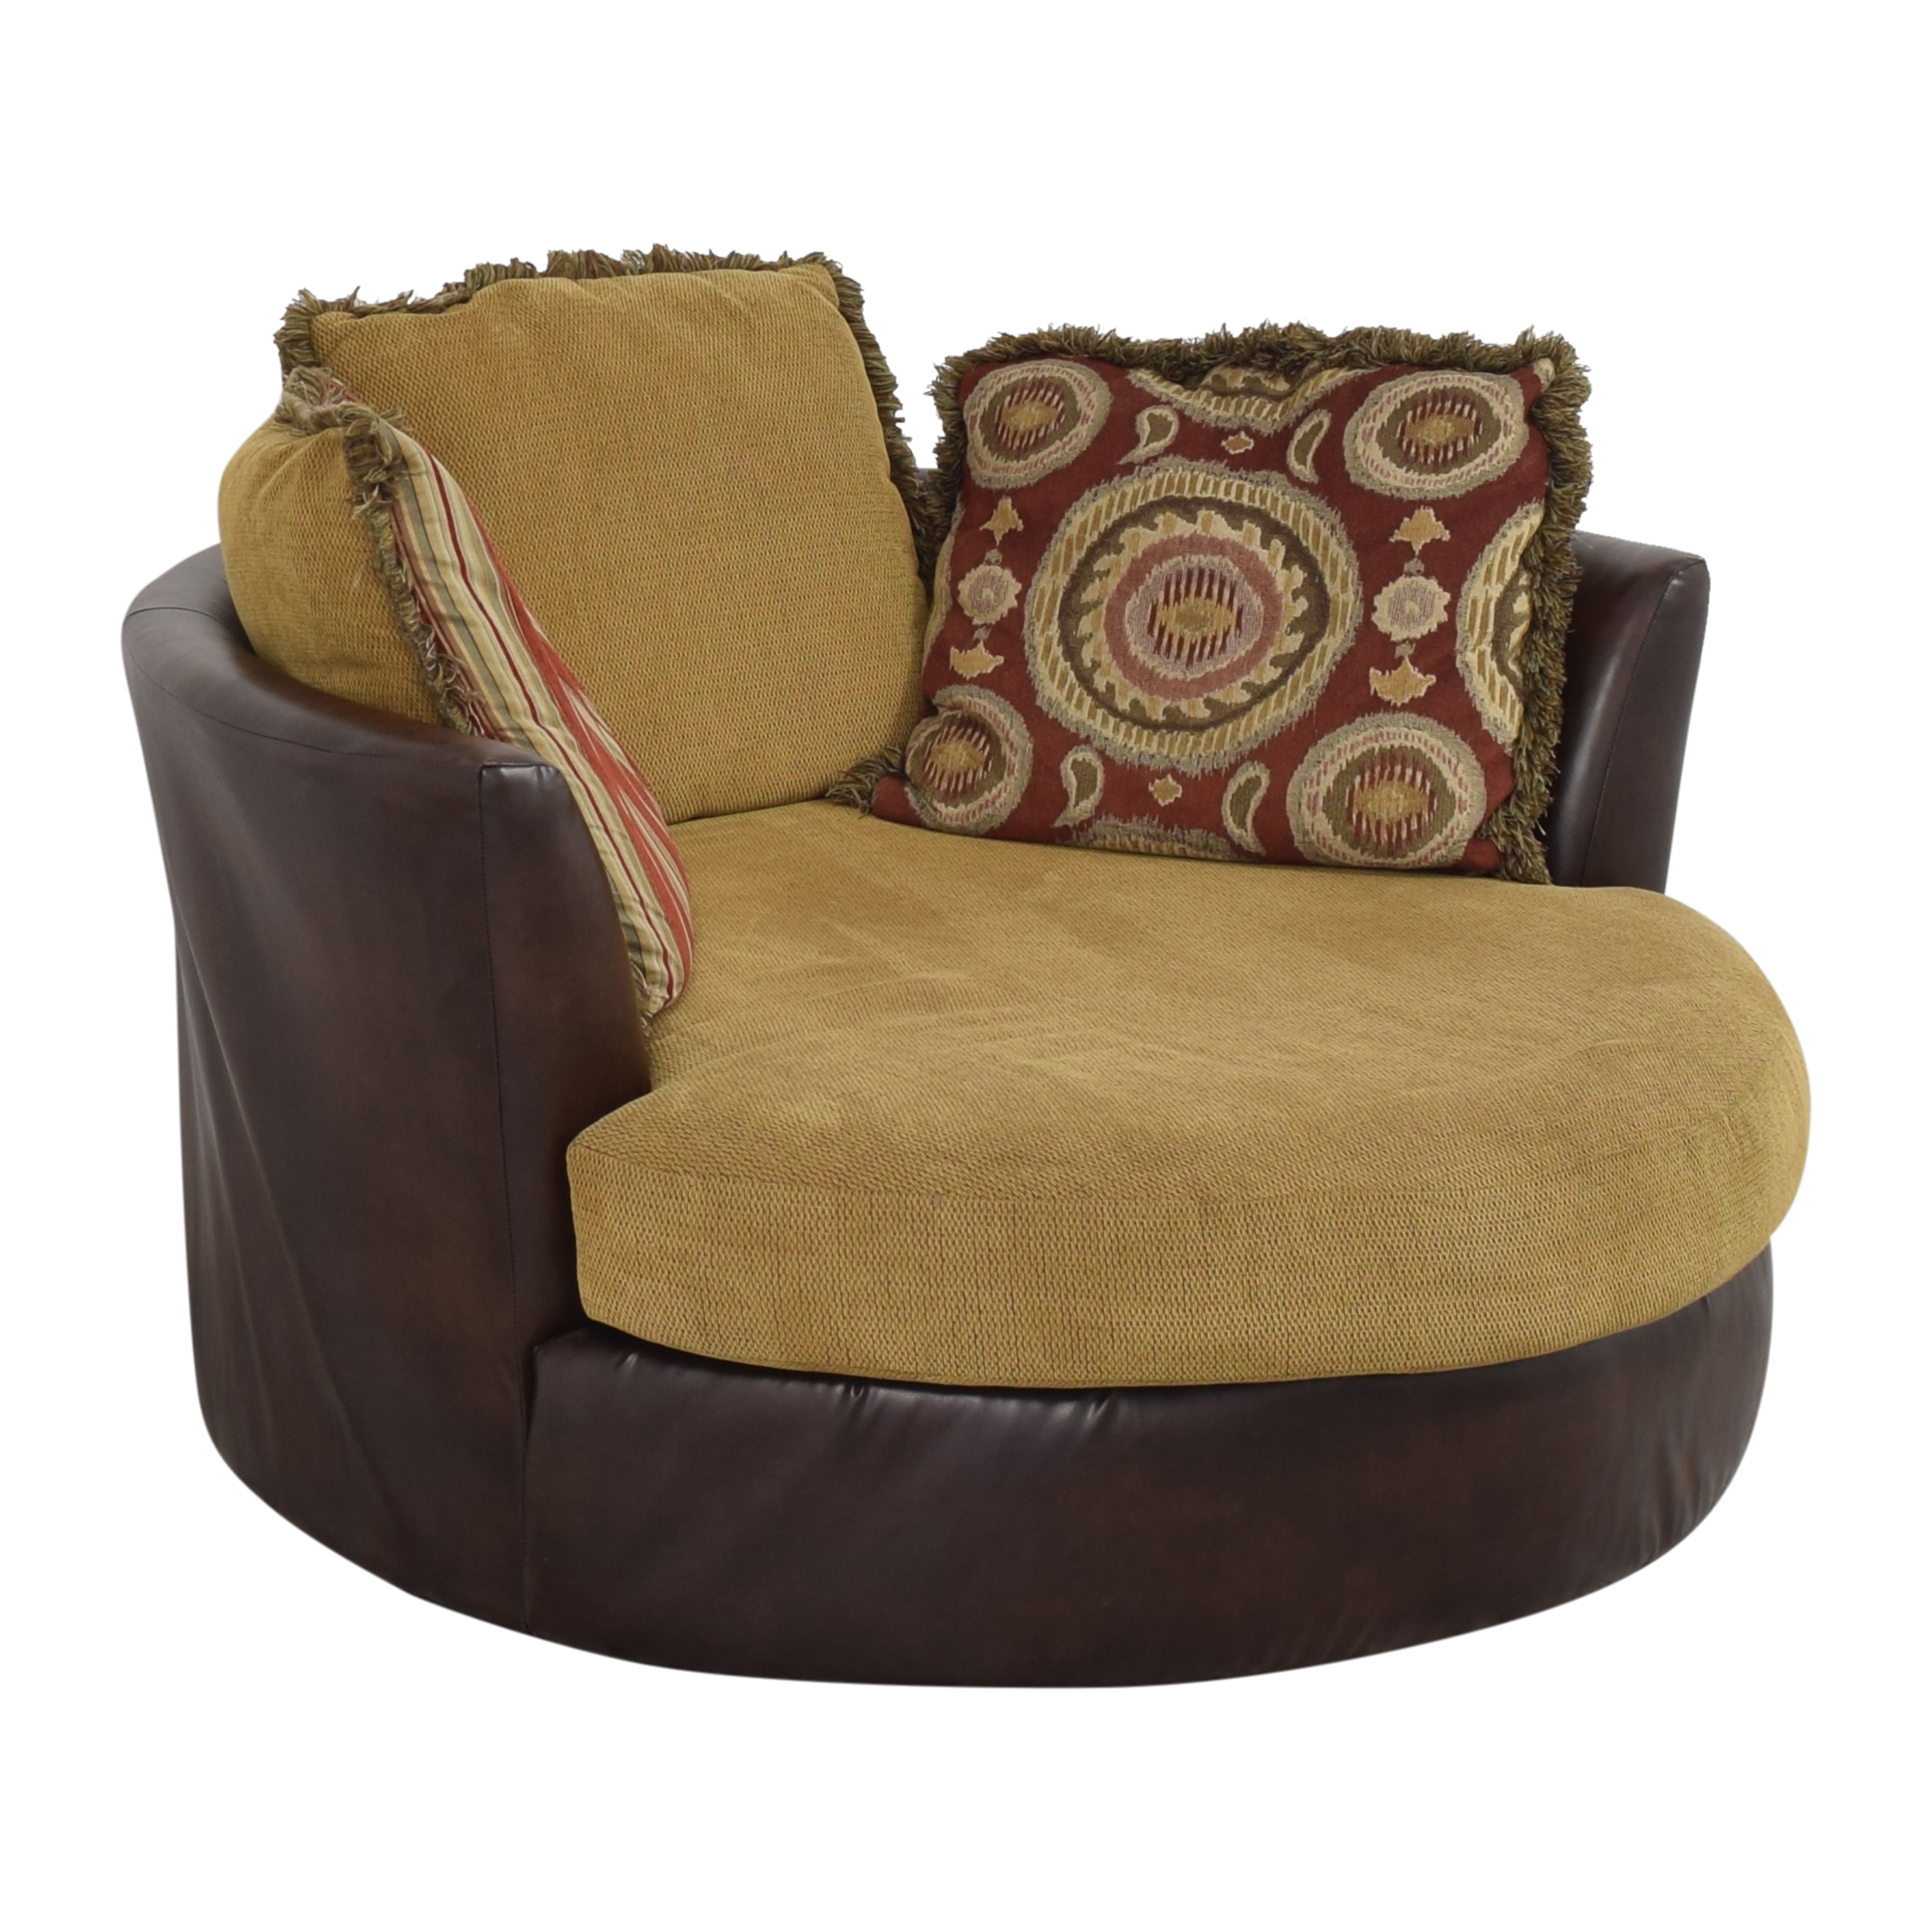 Albany Industries Albany Industries Newport Swivel Chair brown & tan